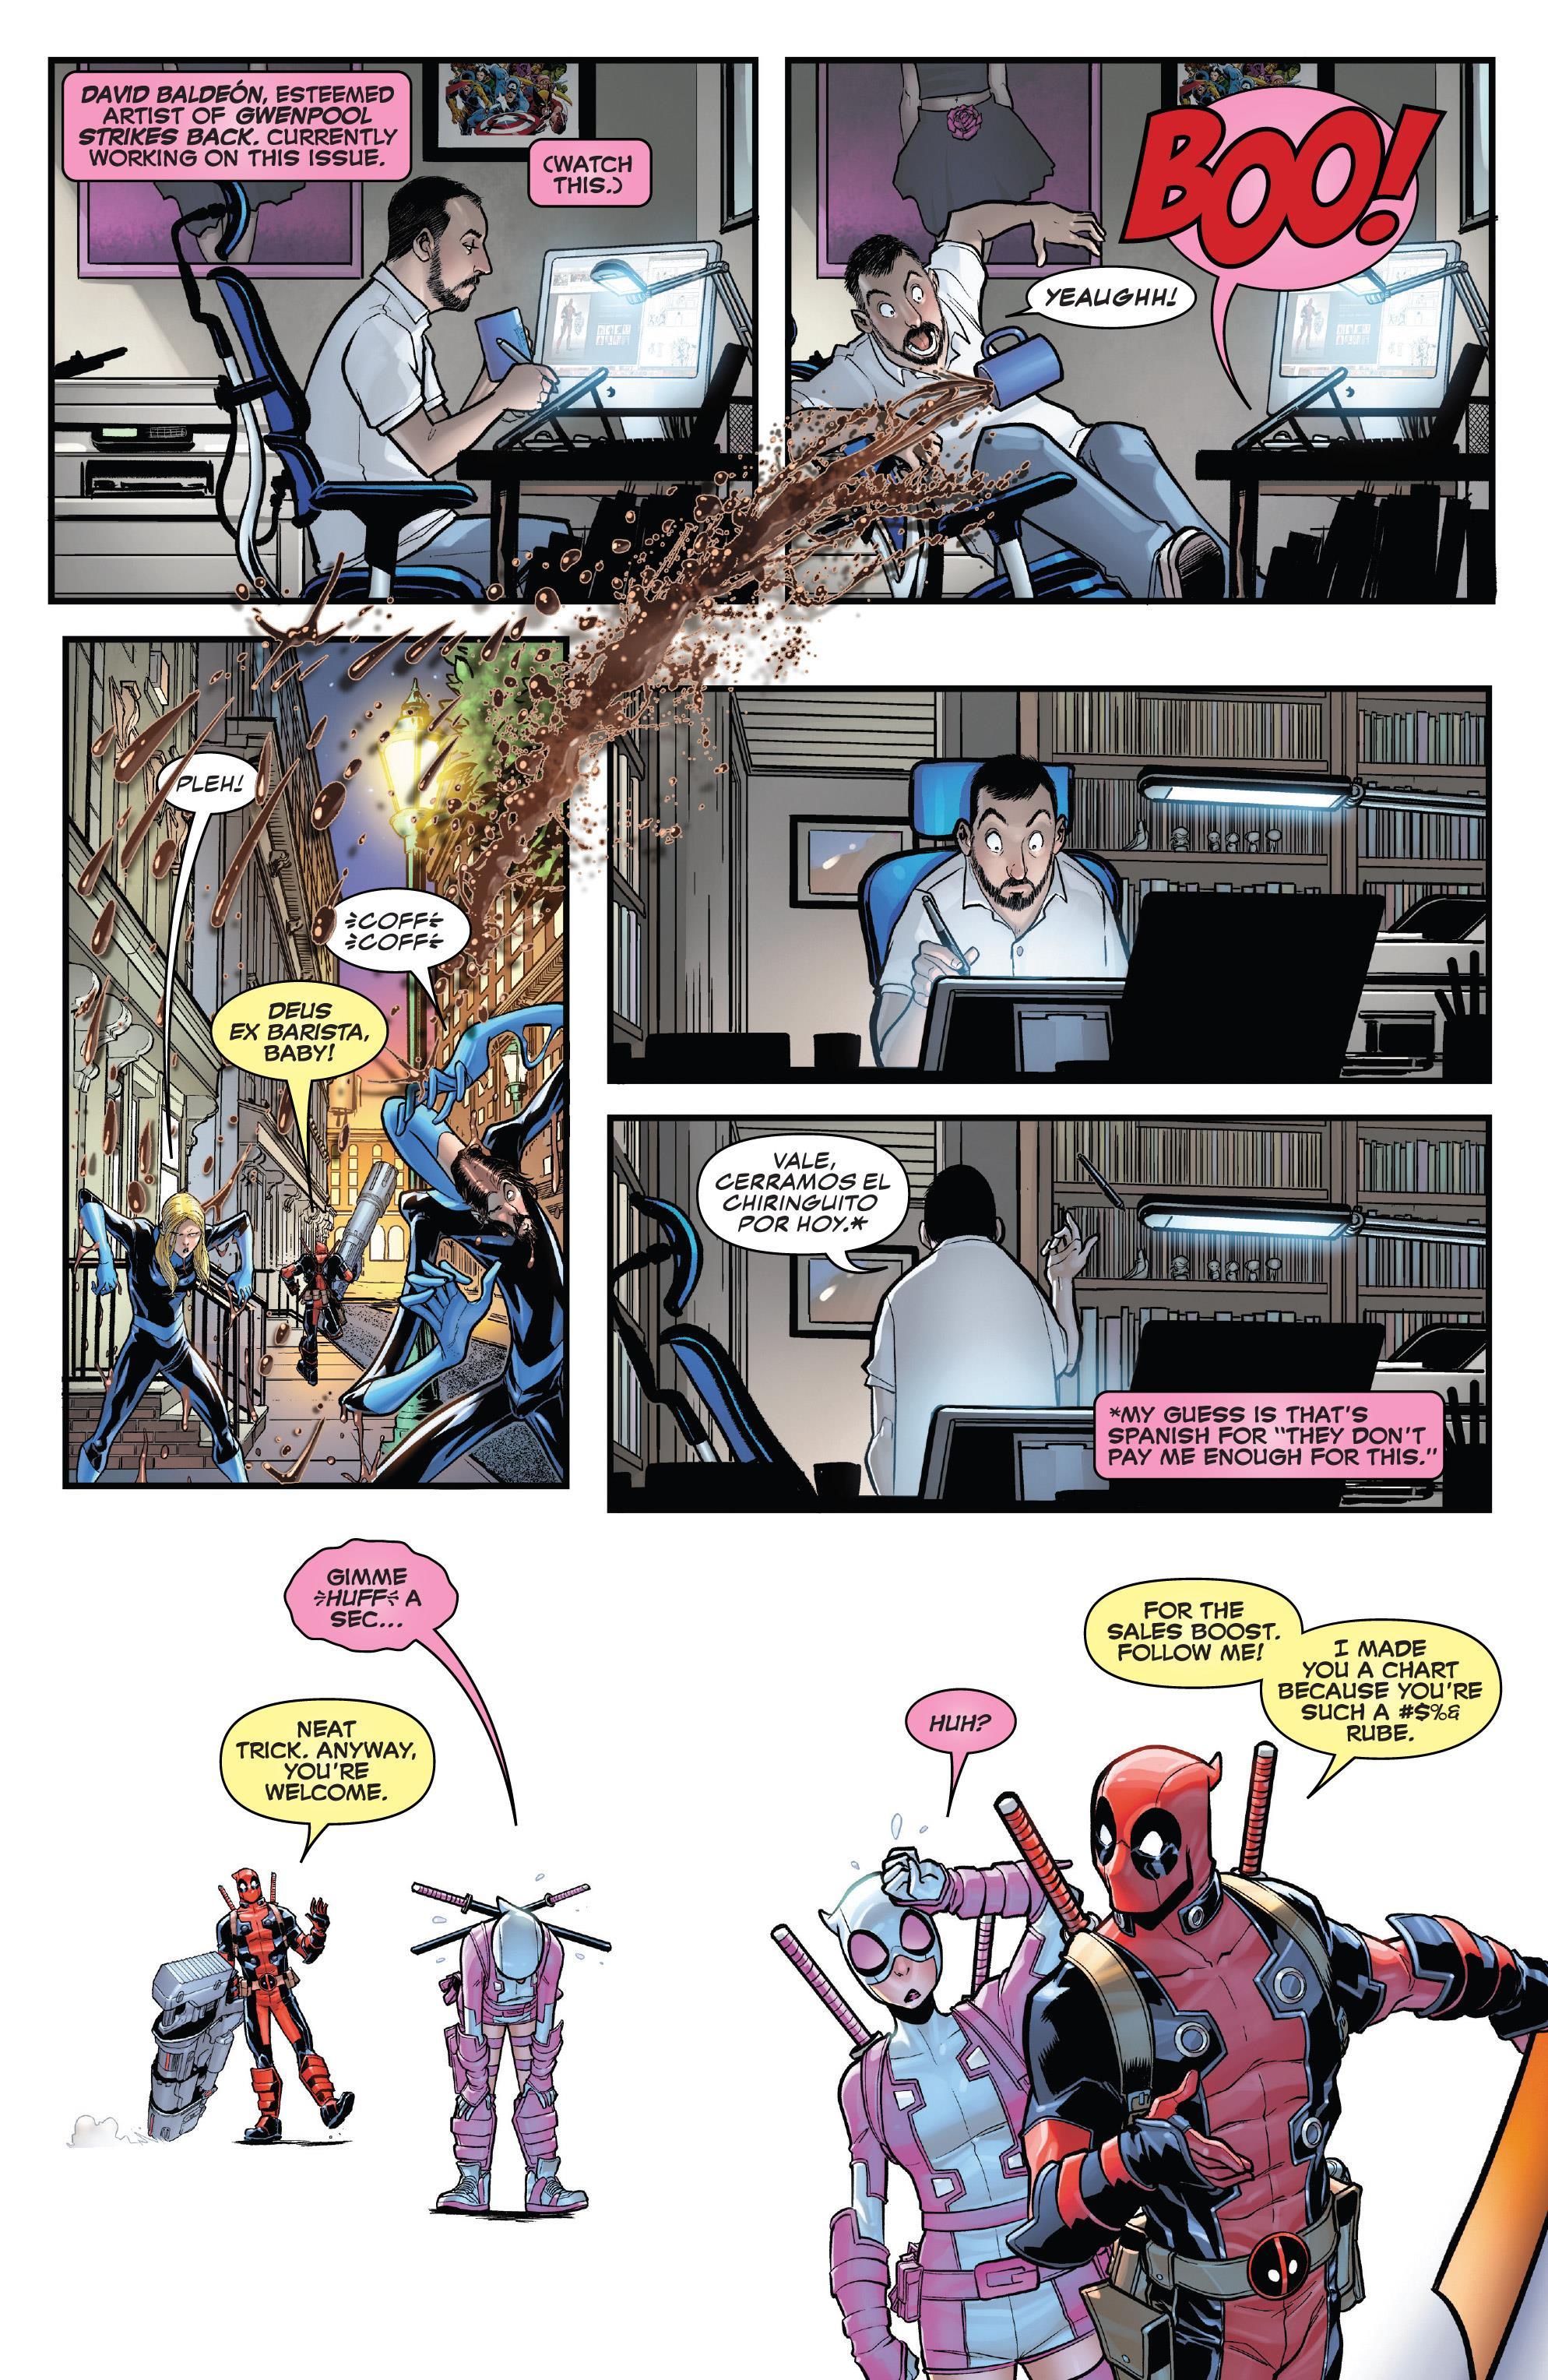 Gwenpool Strikes Back V2019 #003 (2019) - Page 4